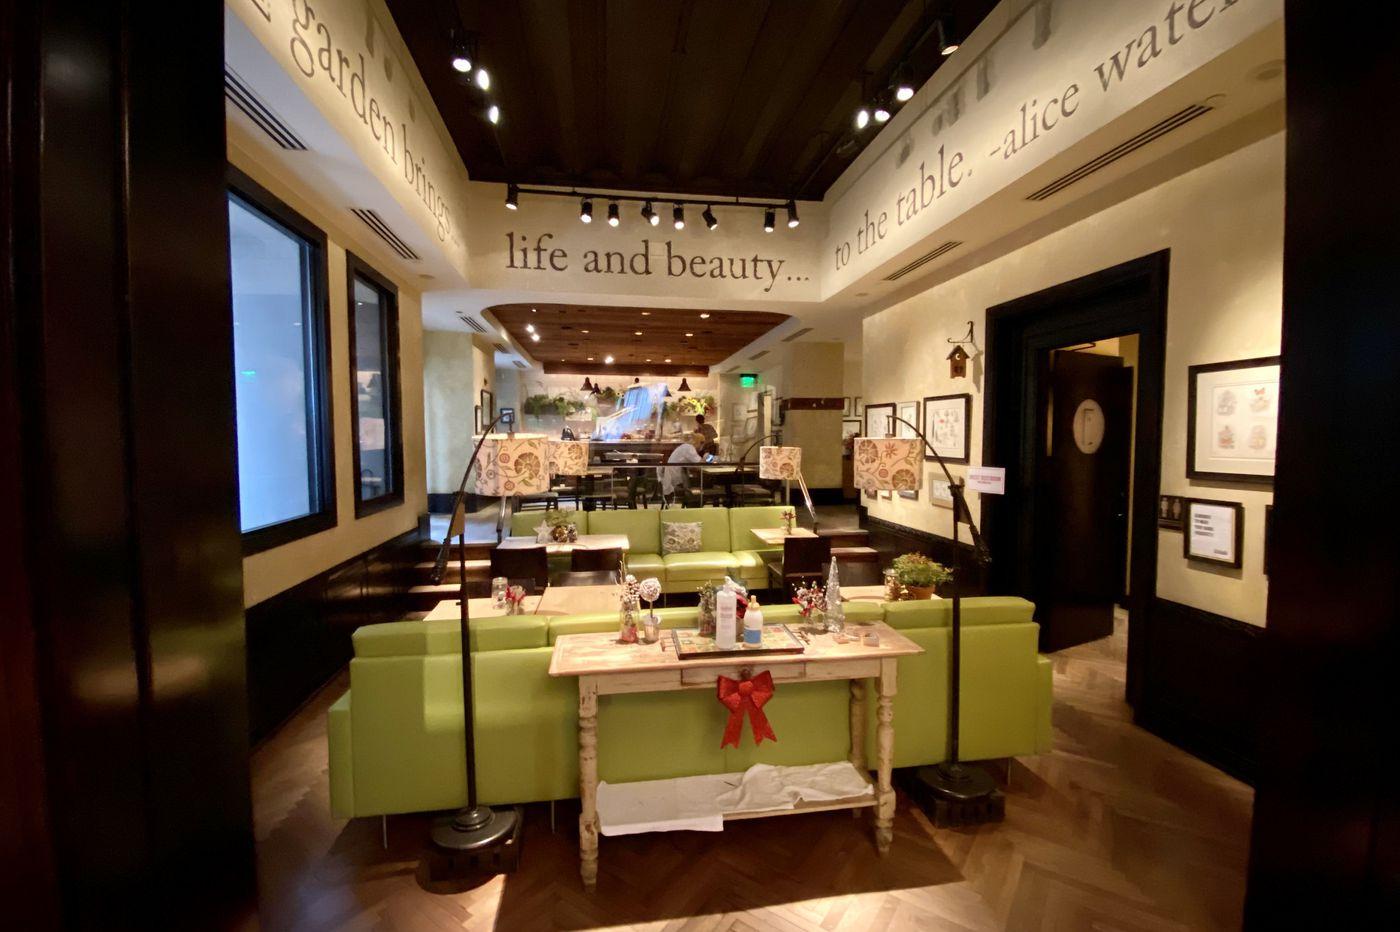 Indoor dining will return to Philadelphia on Saturday. Will it help restaurants?